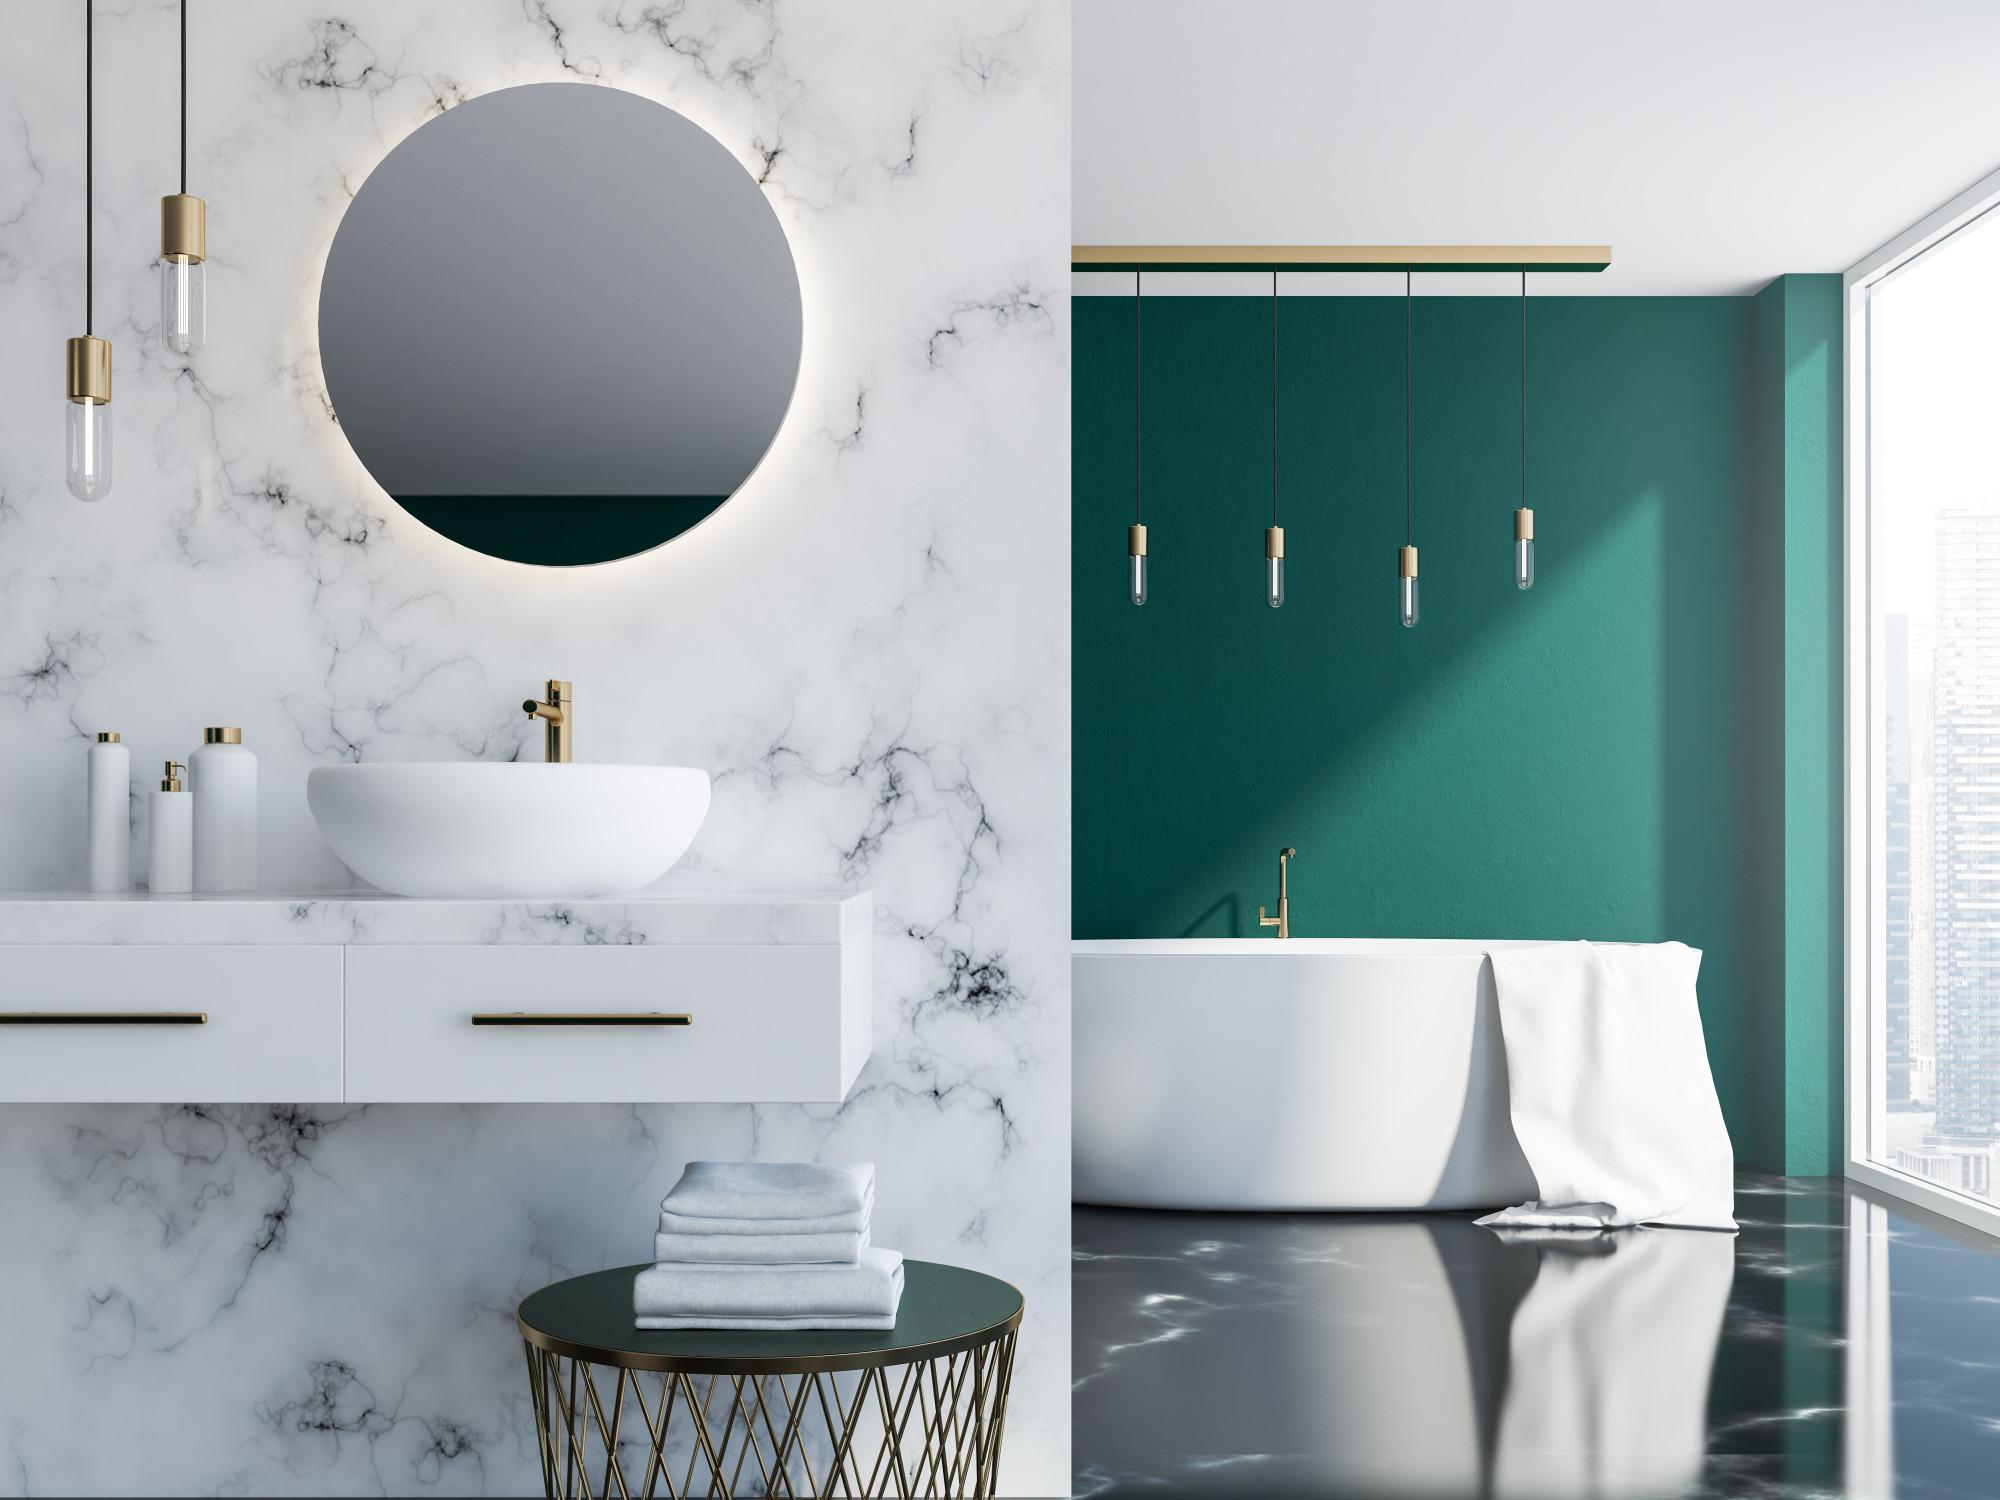 10 Modern Bathroom Design Ideas for 2020